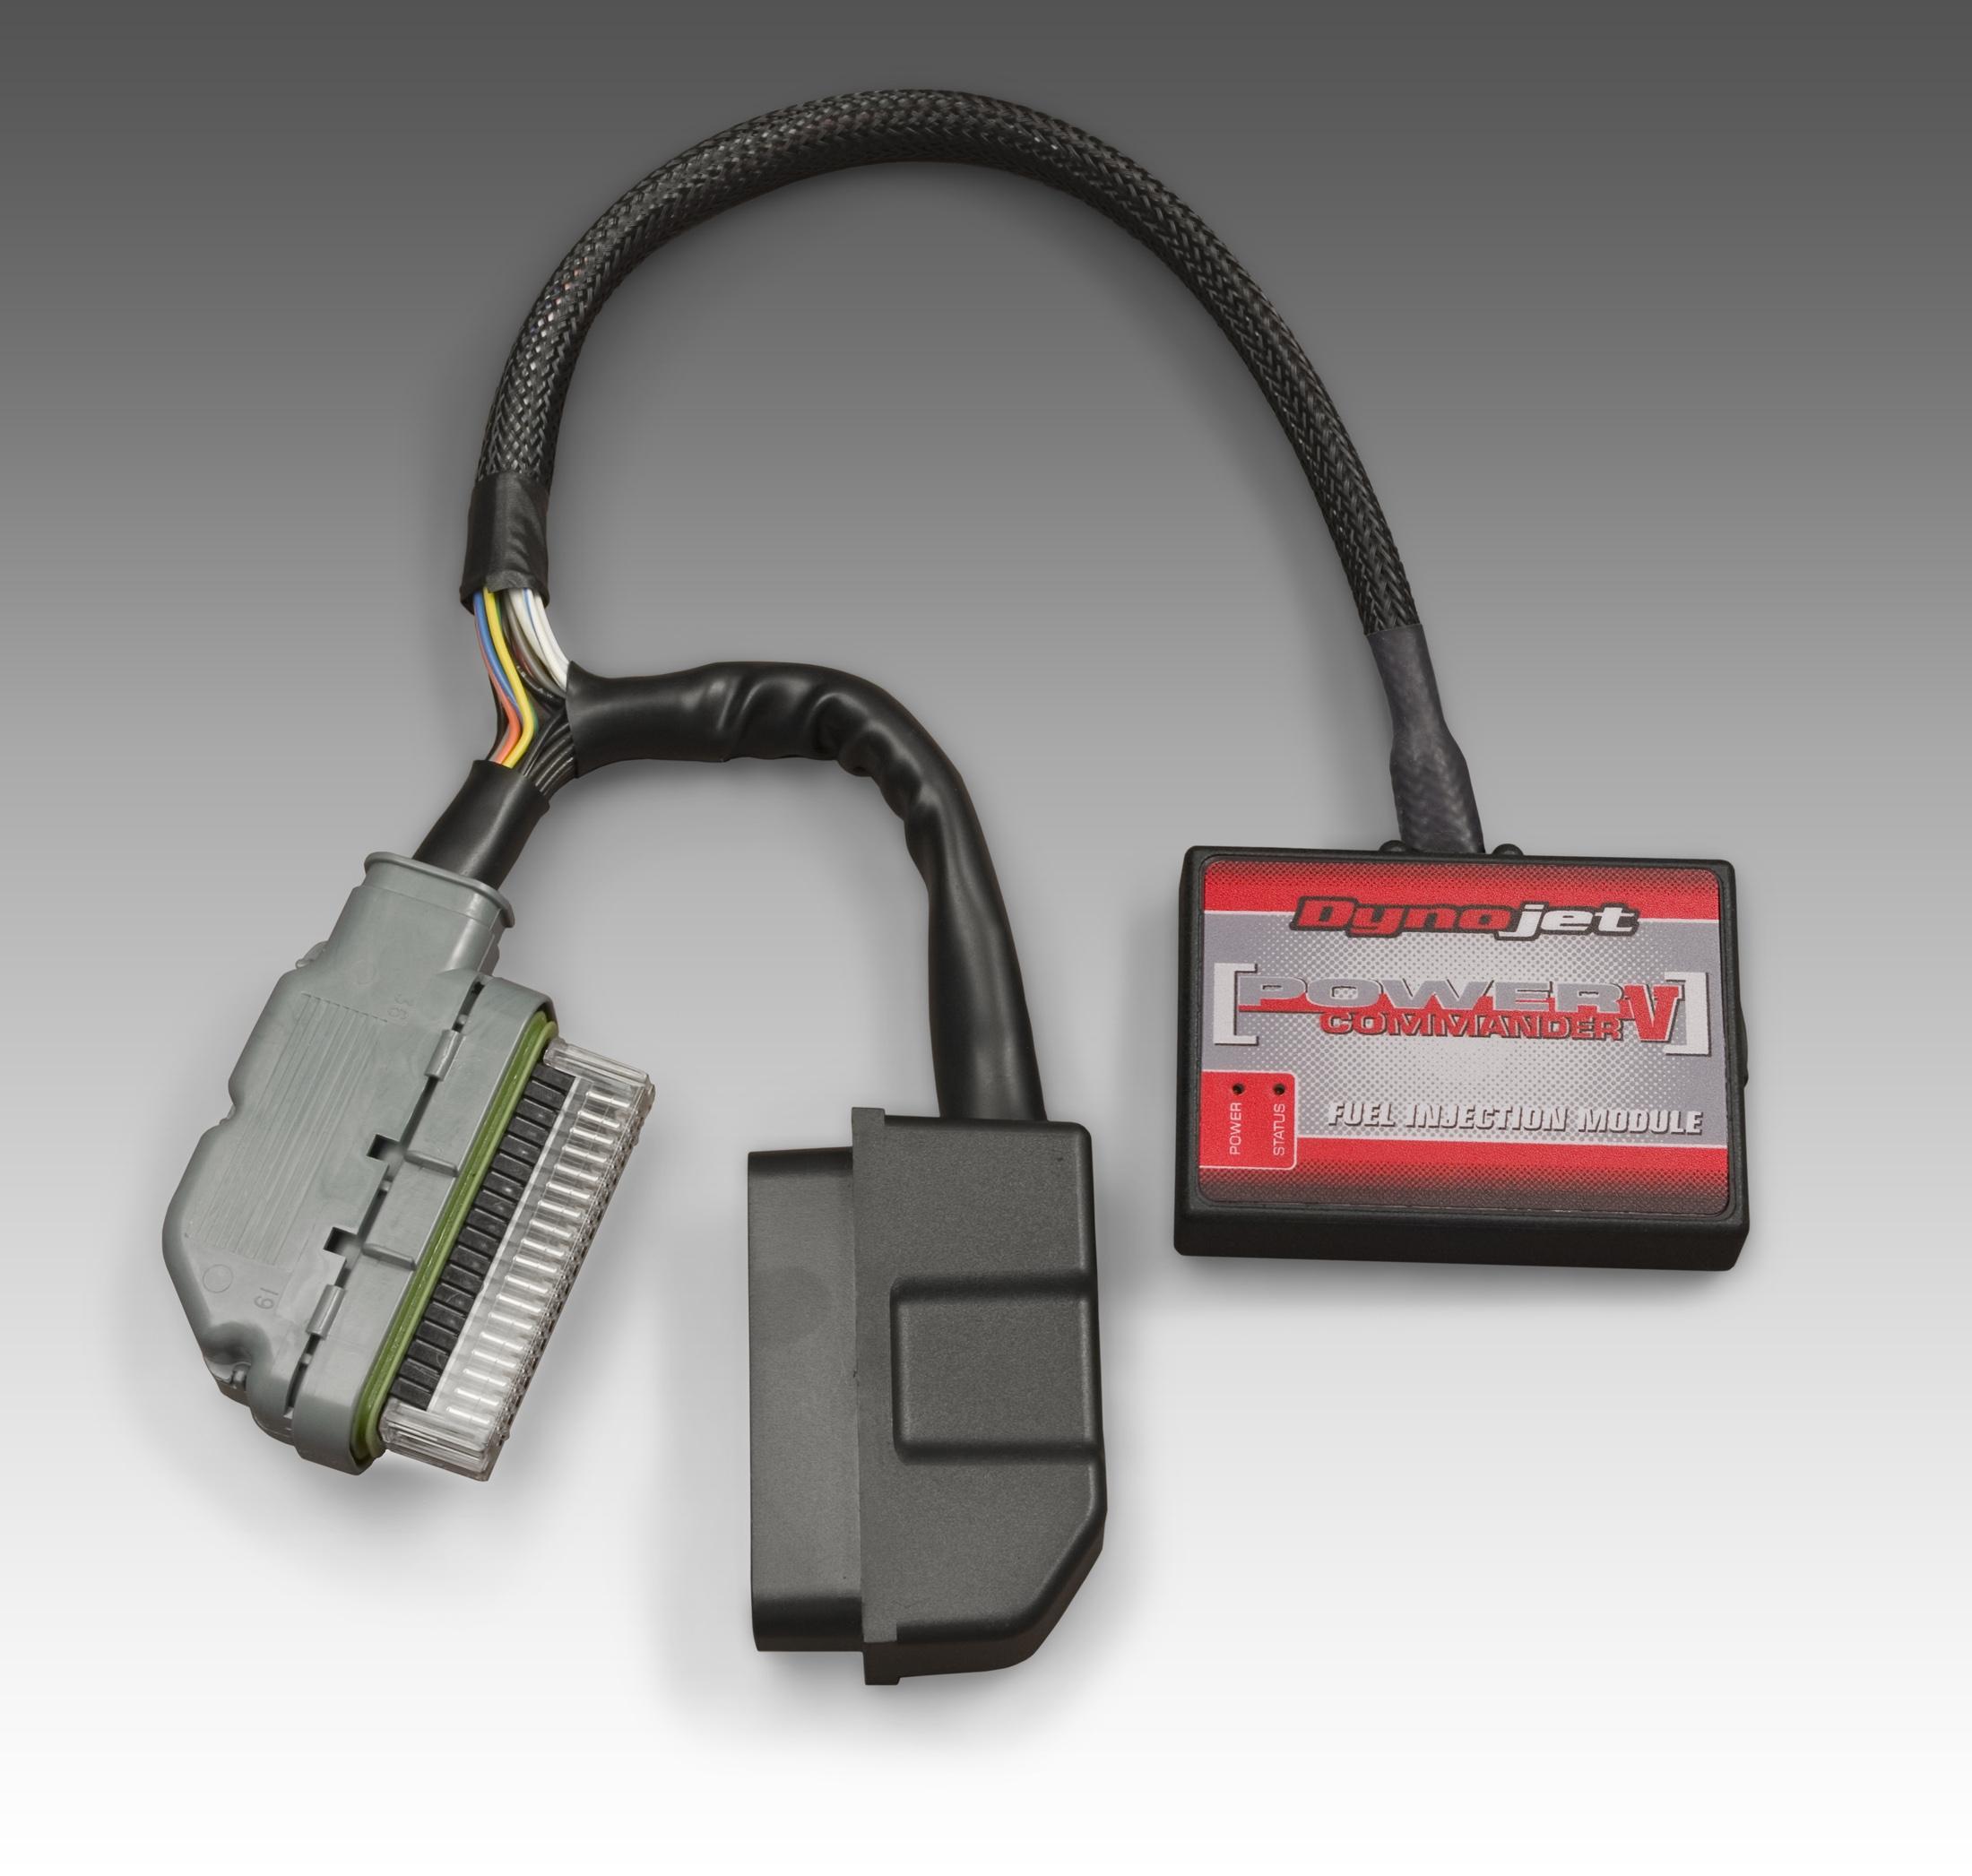 Details about E22-044 - Unit - Fuel+Ignition DYNOJET Power Commander V  YAMAHA YFZ 450 R/X